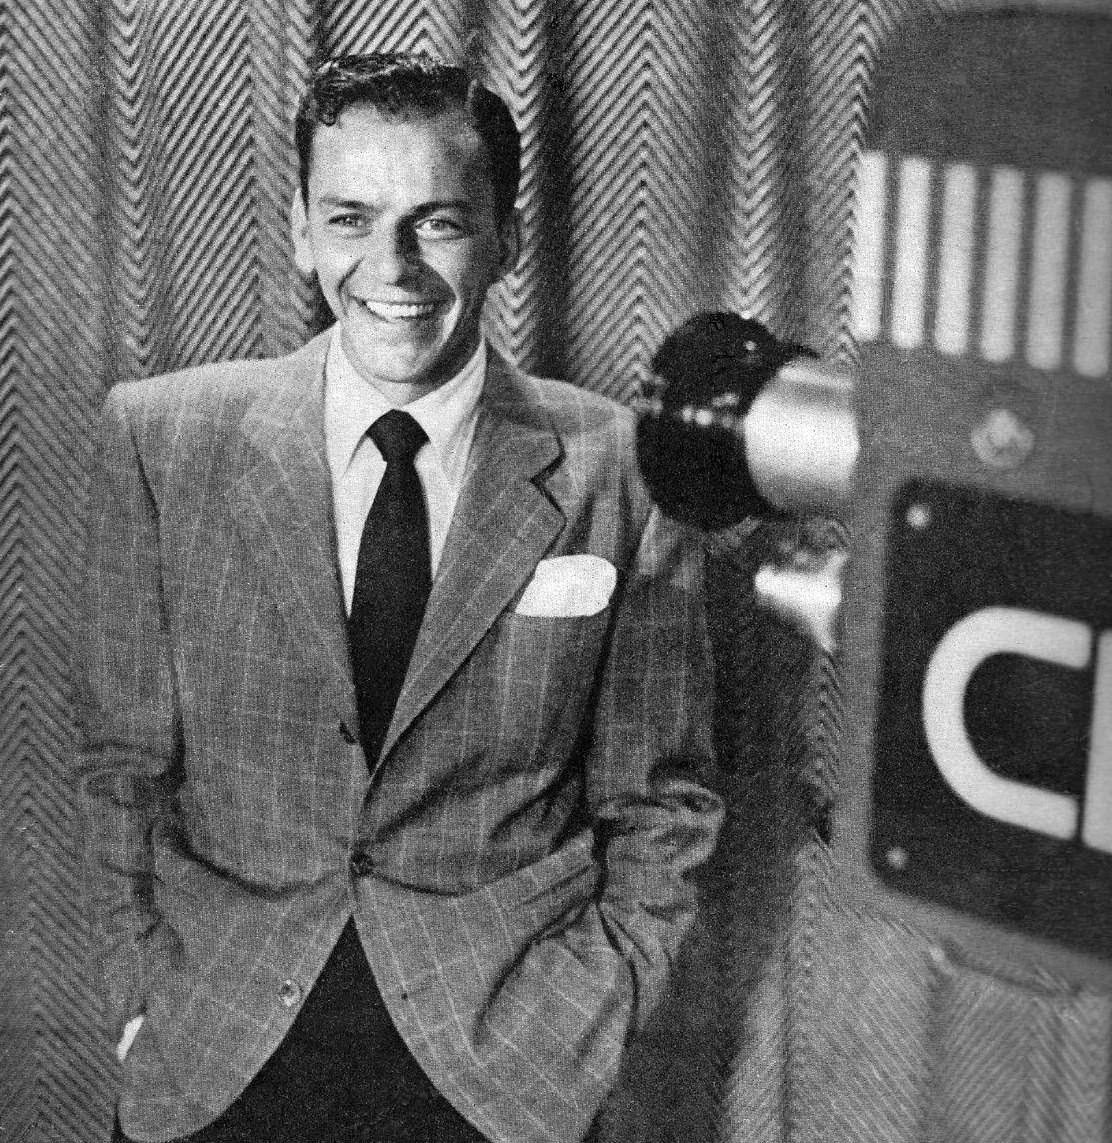 Frank_Sinatra_Metronome_magazine_November_1950.JPG